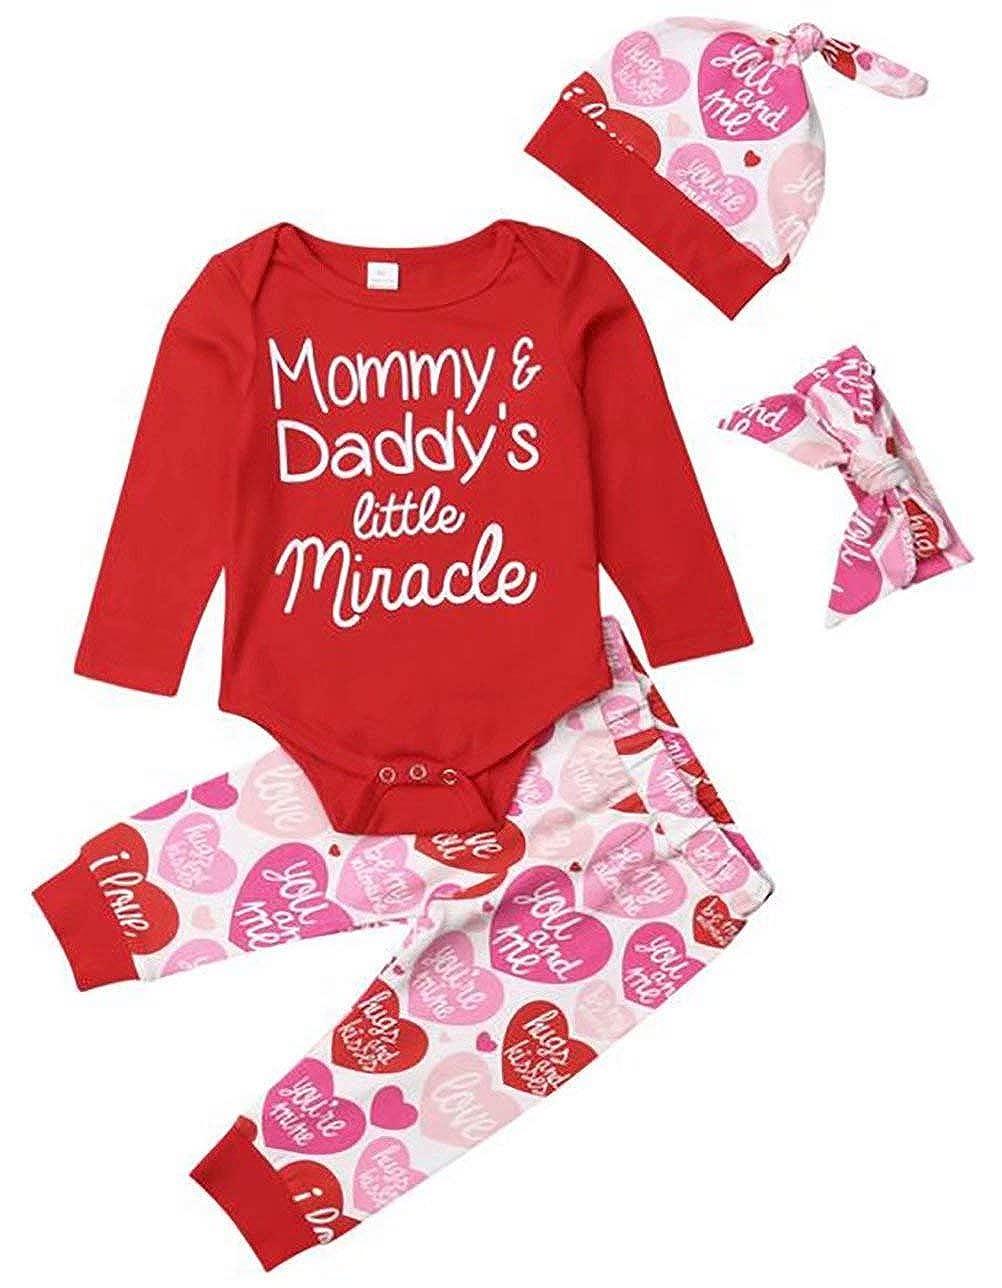 Mrxcff New Toddler Infant Child Kids Baby Boy Plaid Harem Long Pants Leggings Checked Zipper Patchwork Pants Clothing 1-6T Red 5T